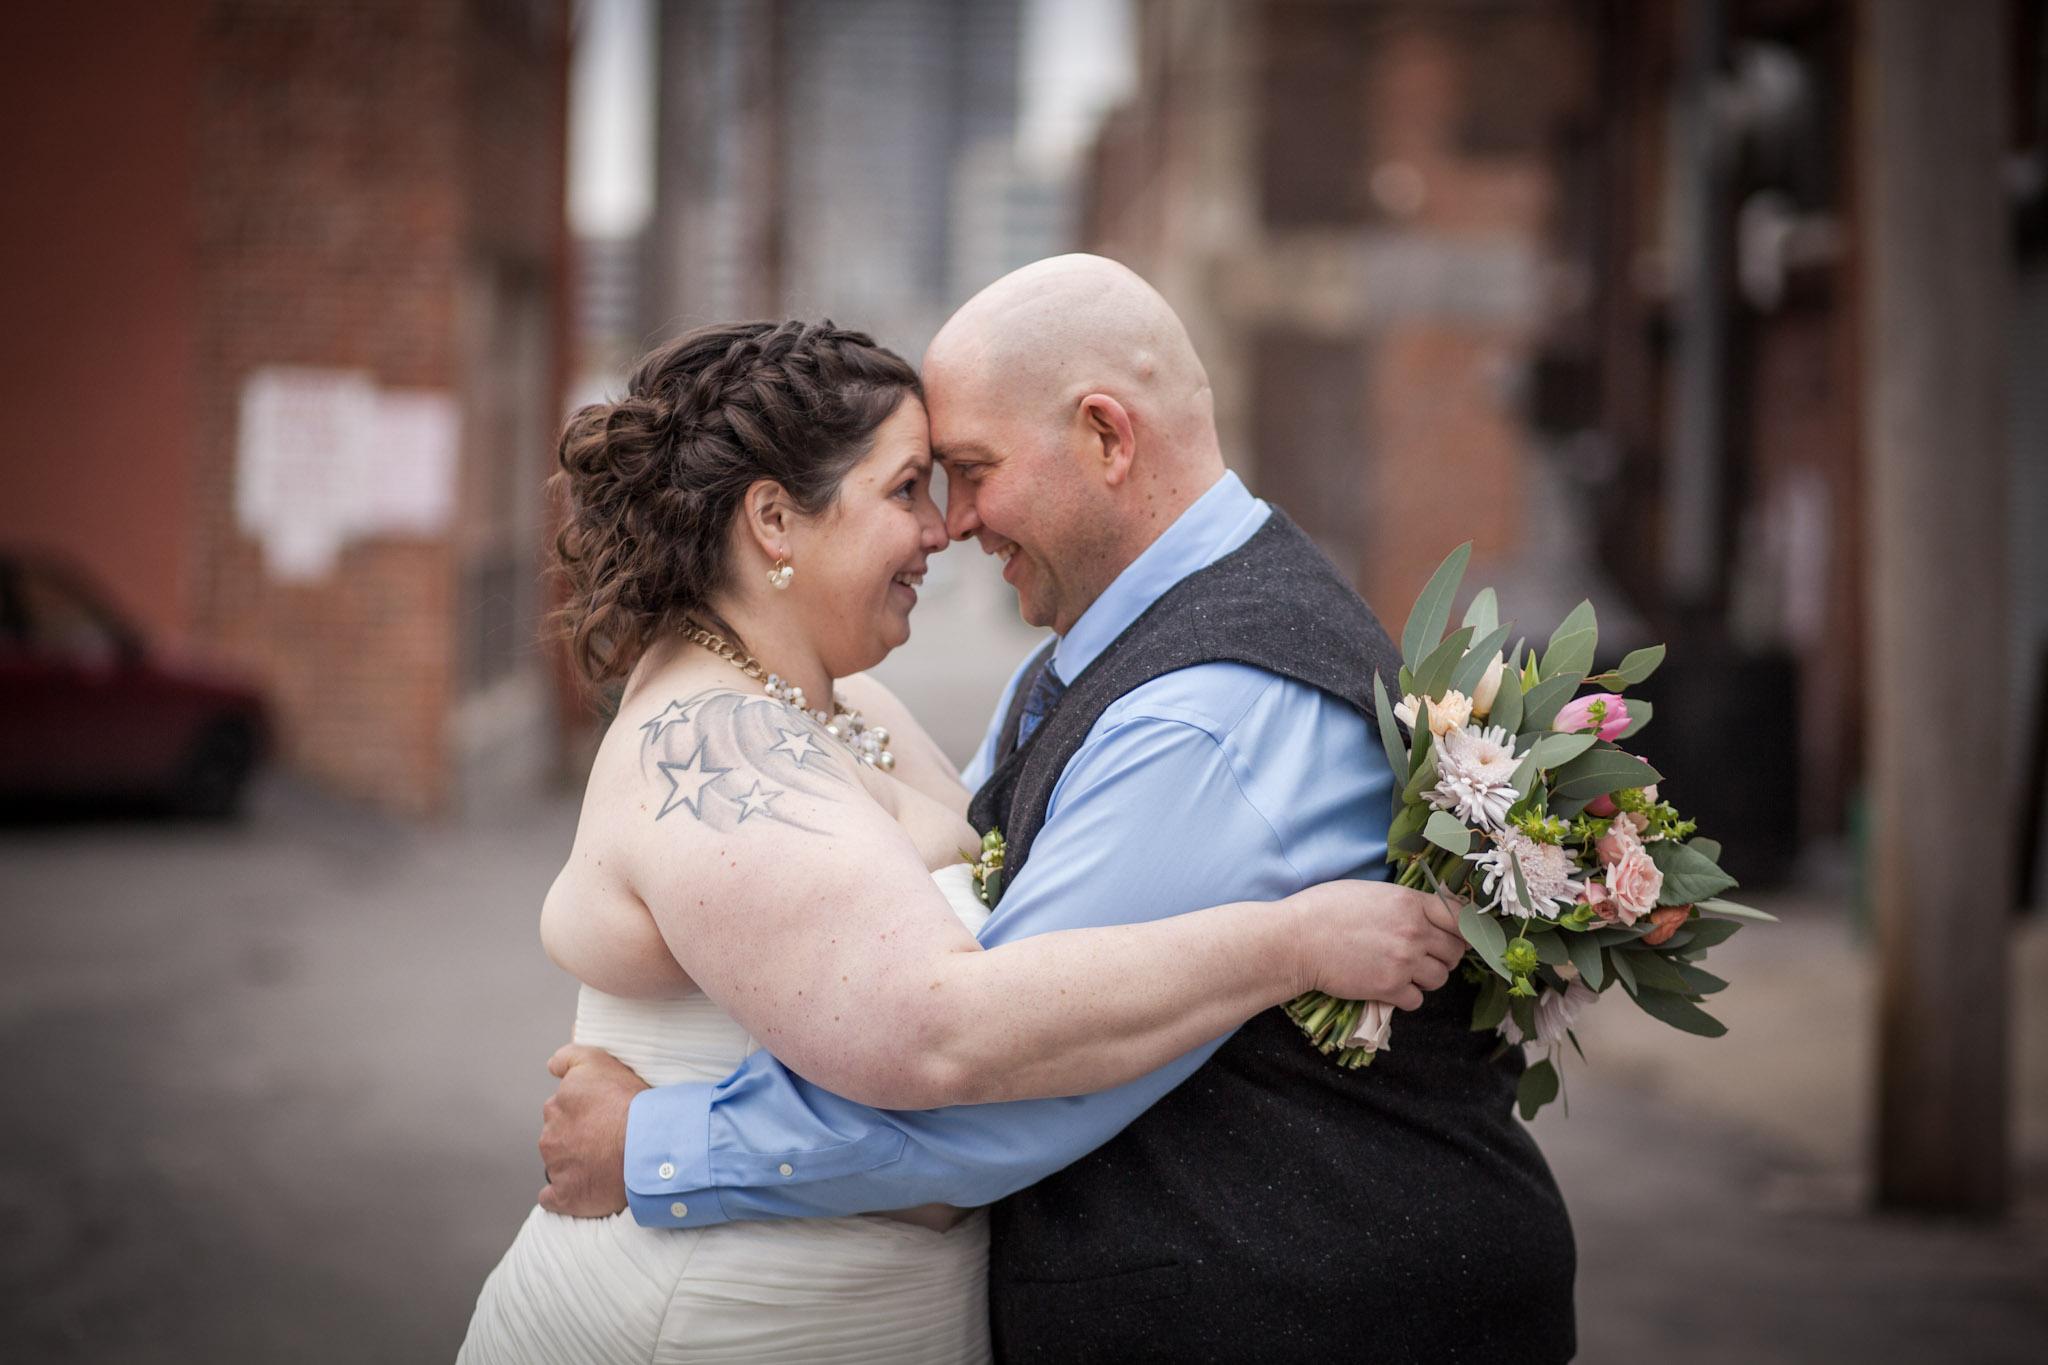 Kansas_City_Small_Wedding_Venue_Elope_Intimate_Ceremony_Budget_Affordable_Lindsey&Tyson-233.jpg